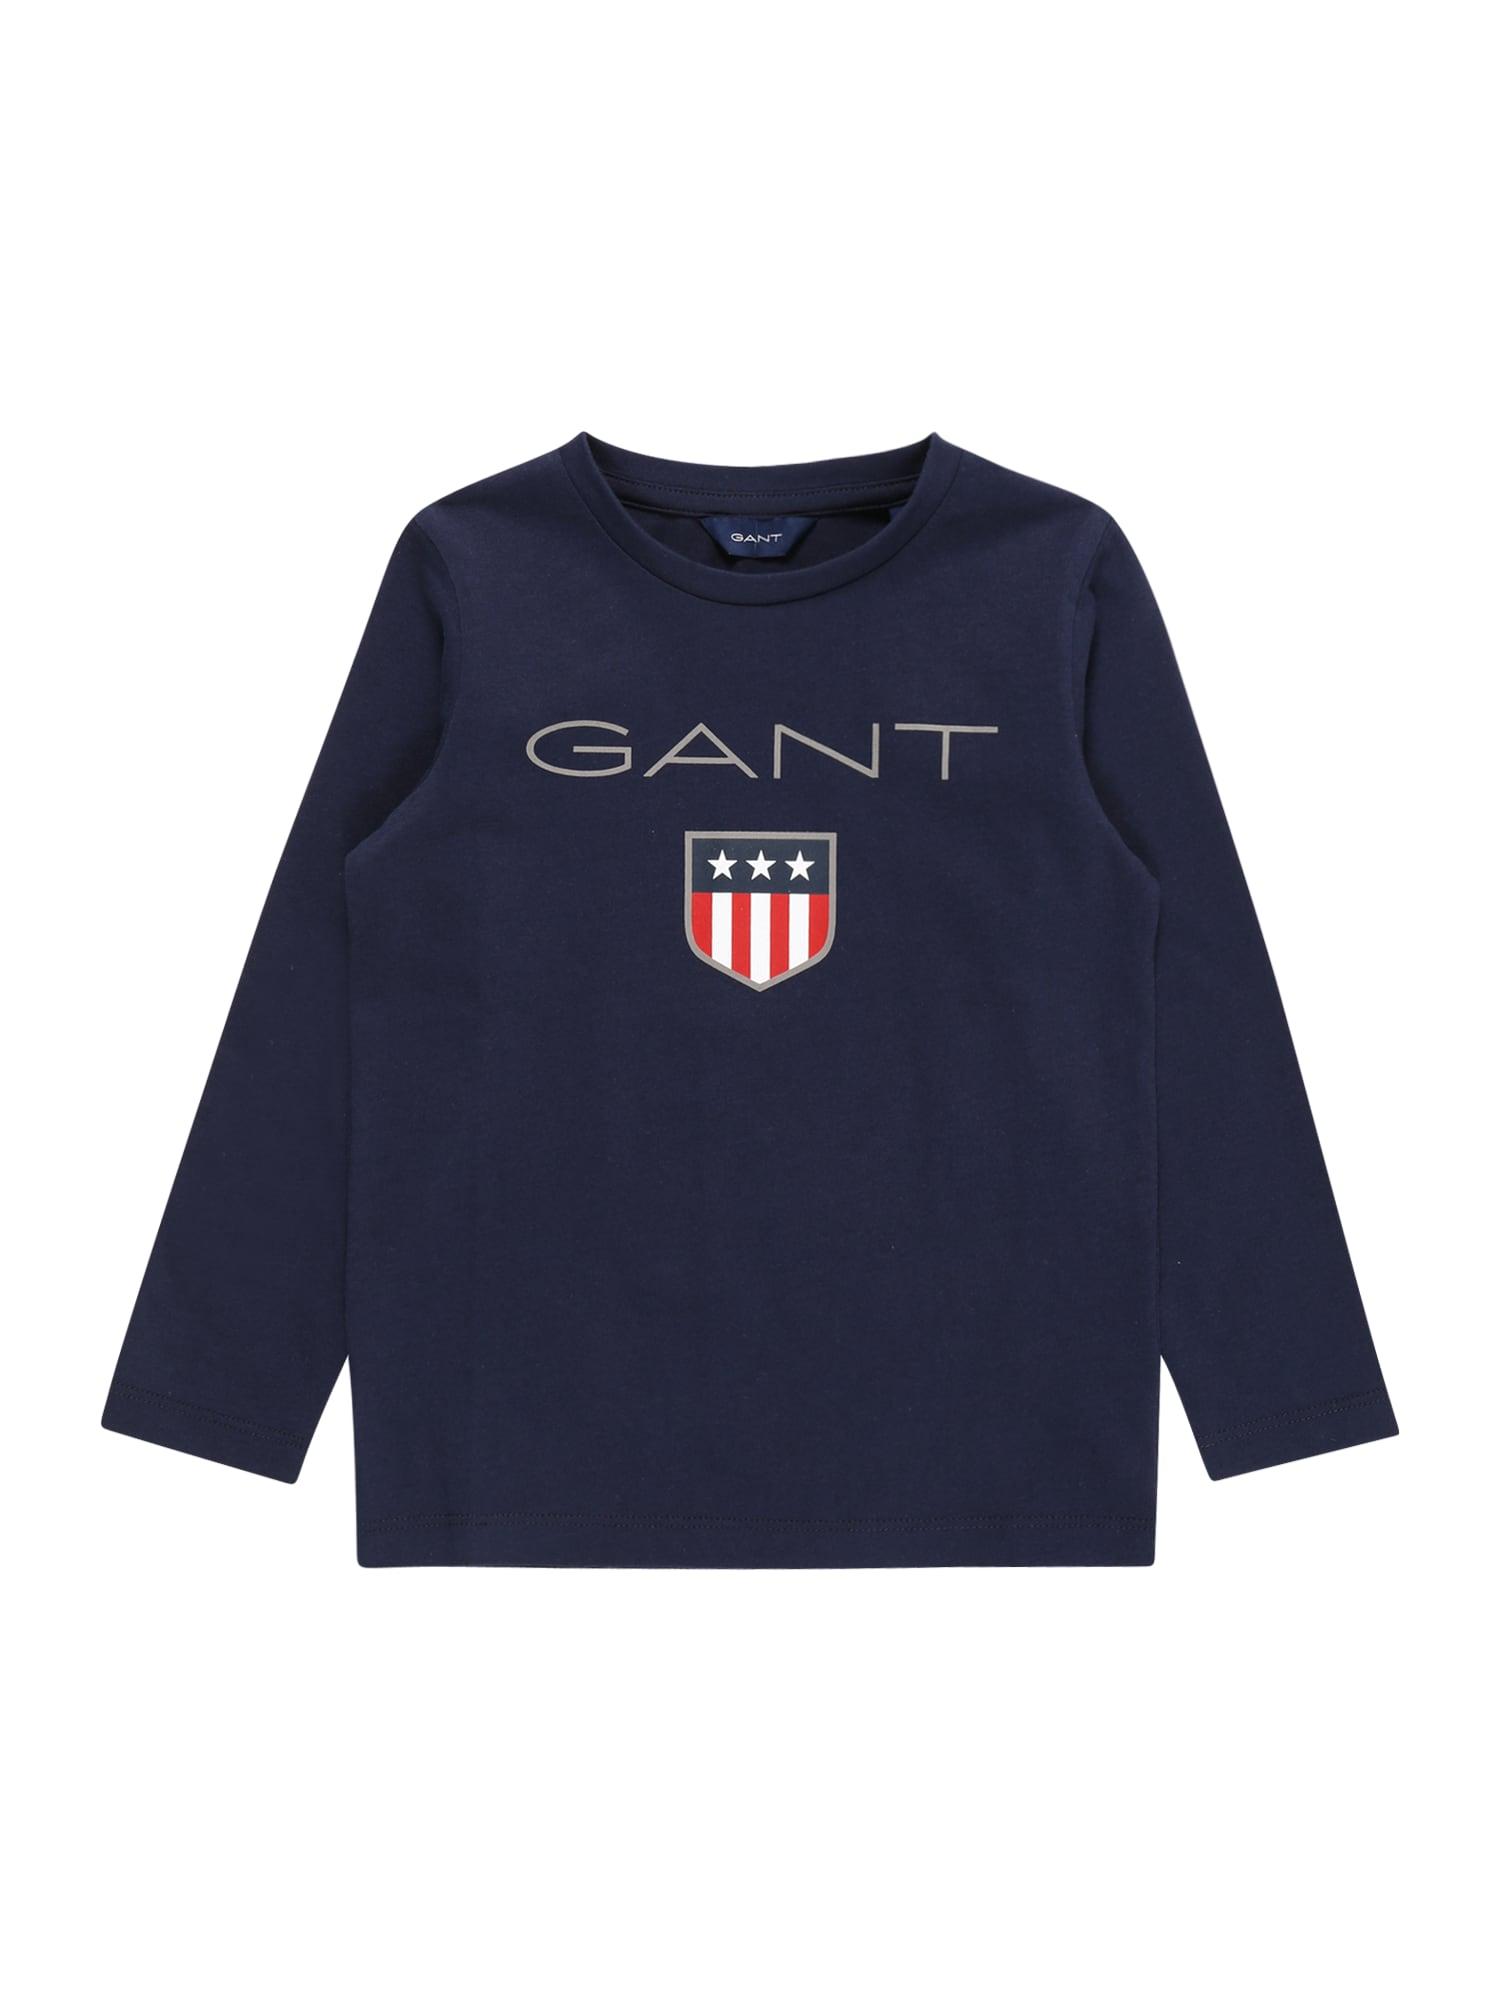 GANT Marškinėliai 'GANT SHIELD' tamsiai mėlyna